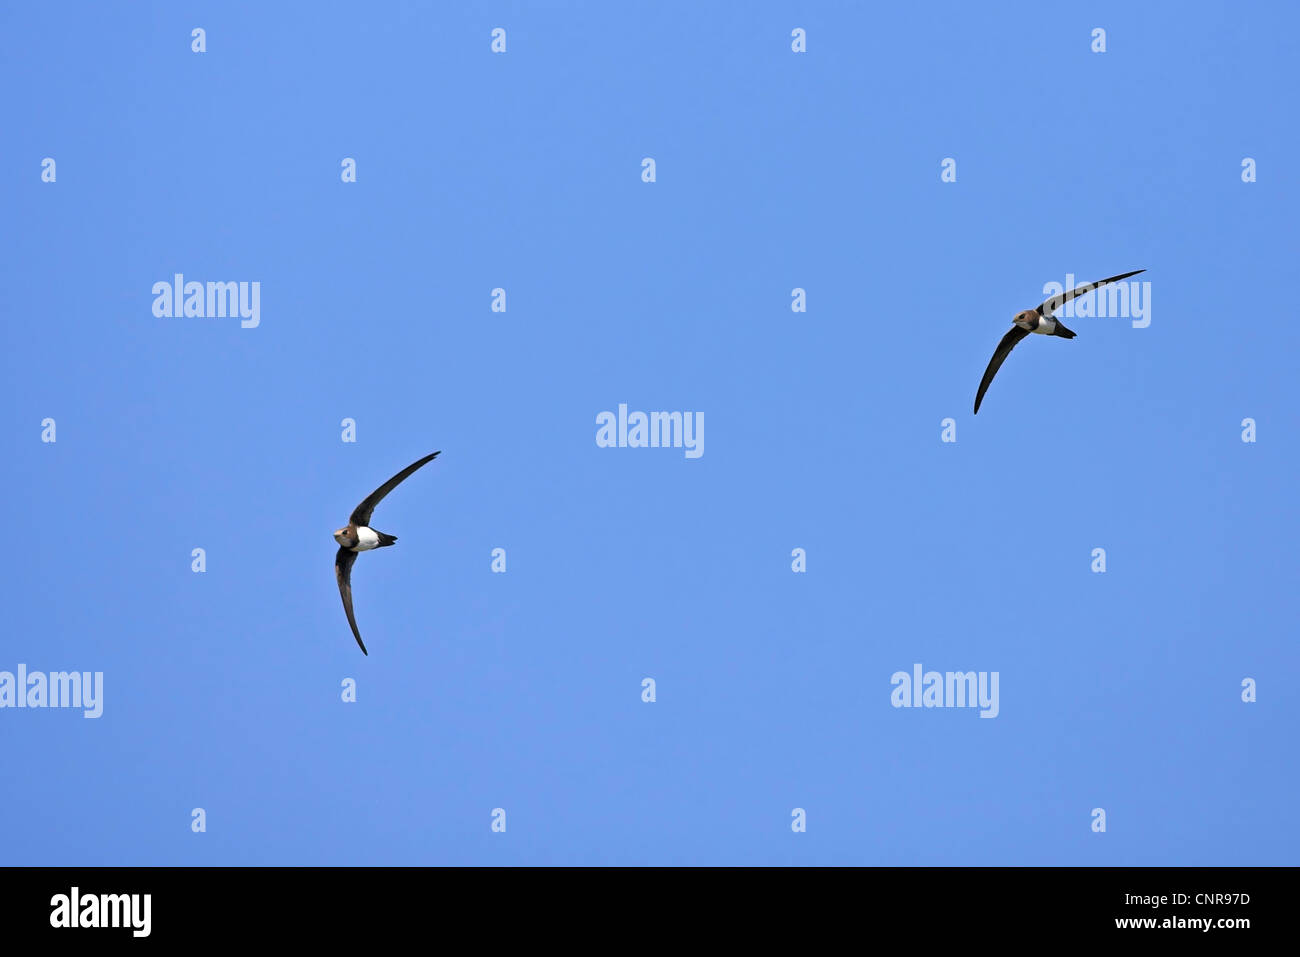 alpine swift (Apus melba, Tachymarptis melba), two individuals flying, Austria Stock Photo